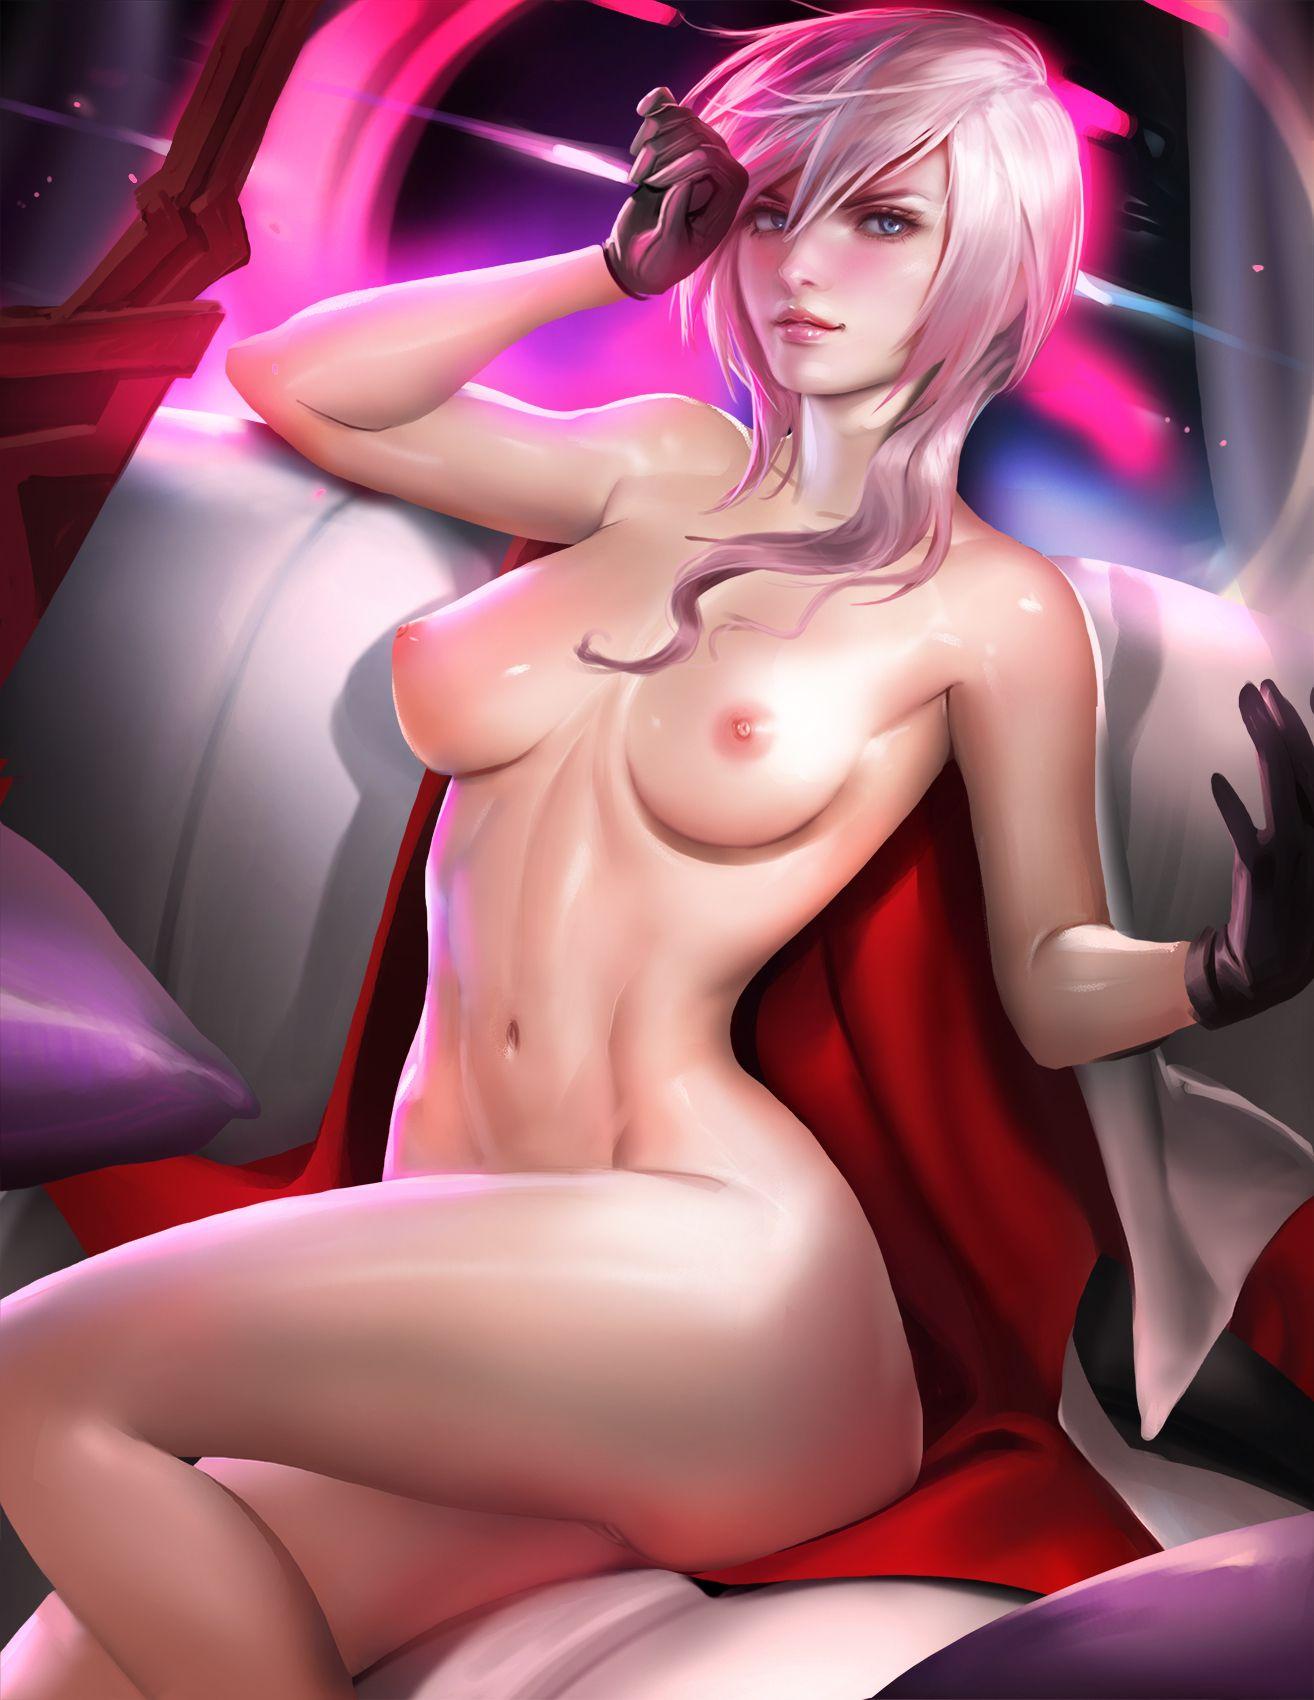 Vampier hentia nude adult tube